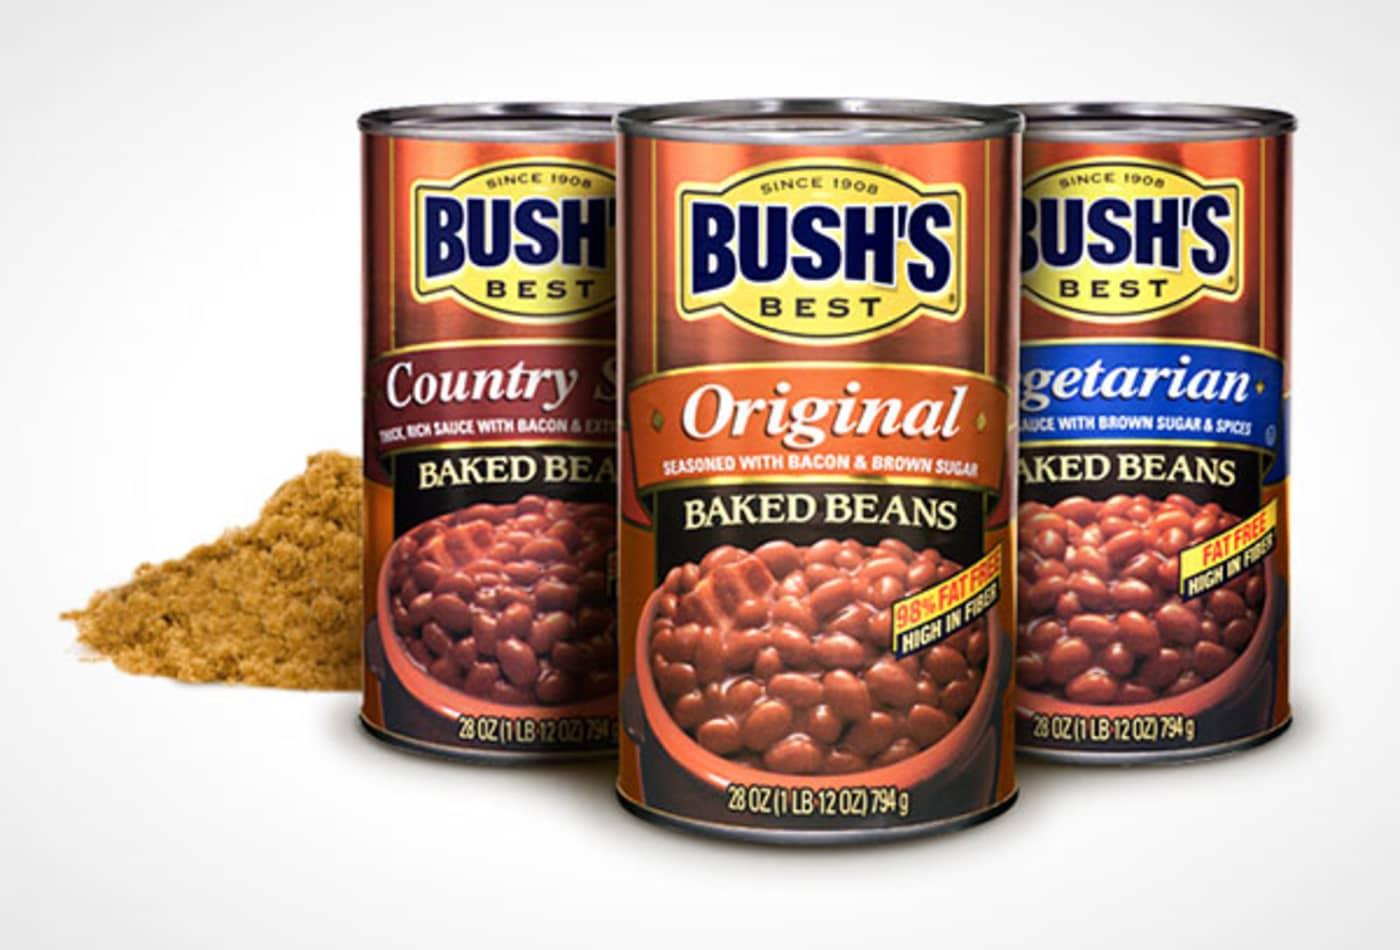 48755424 Bushs-Baked-Beans-Most-Sought-After-Trade-Secrets.jpg